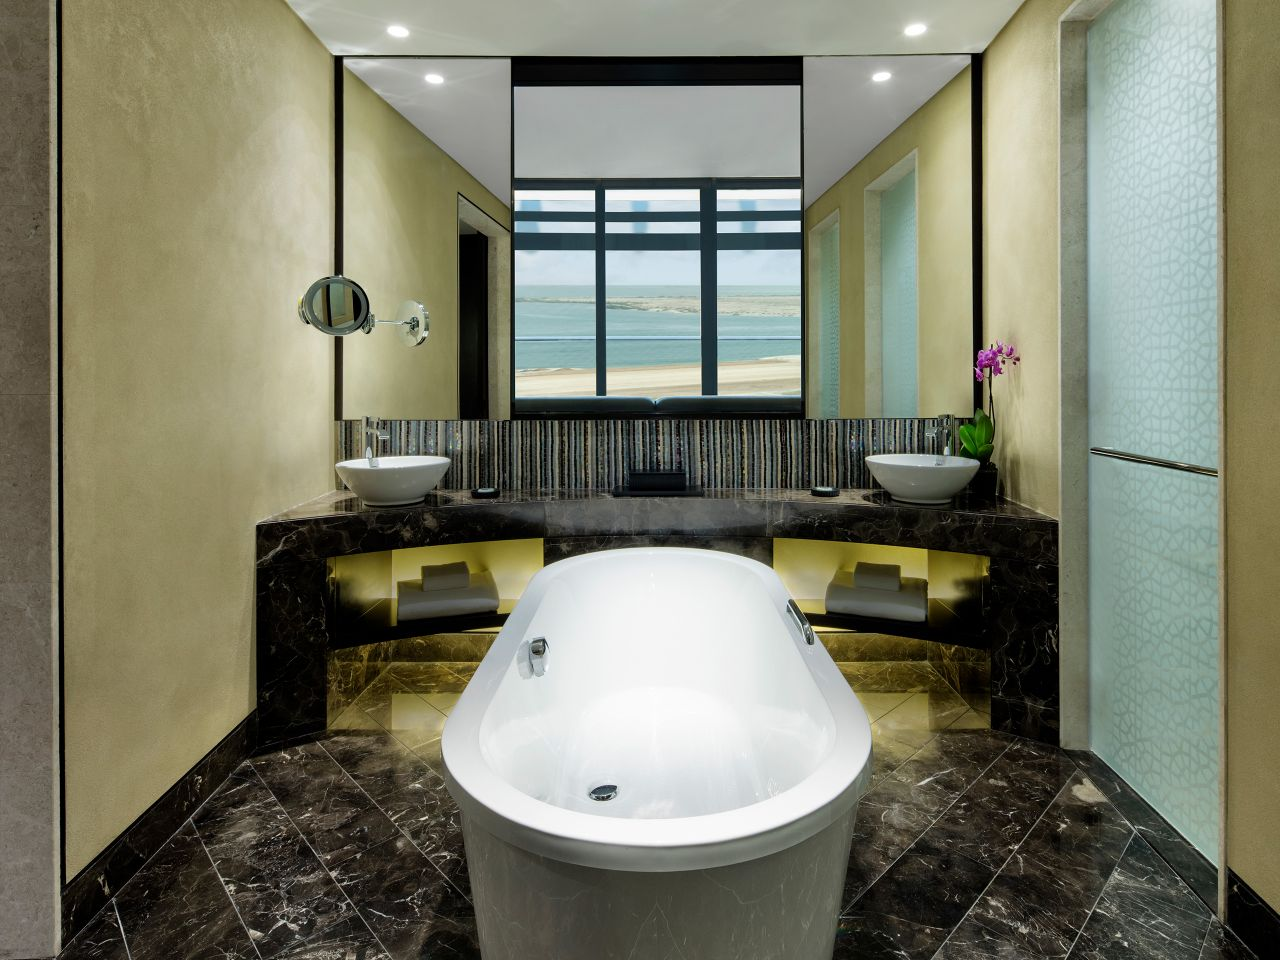 Grand hyatt bathroom